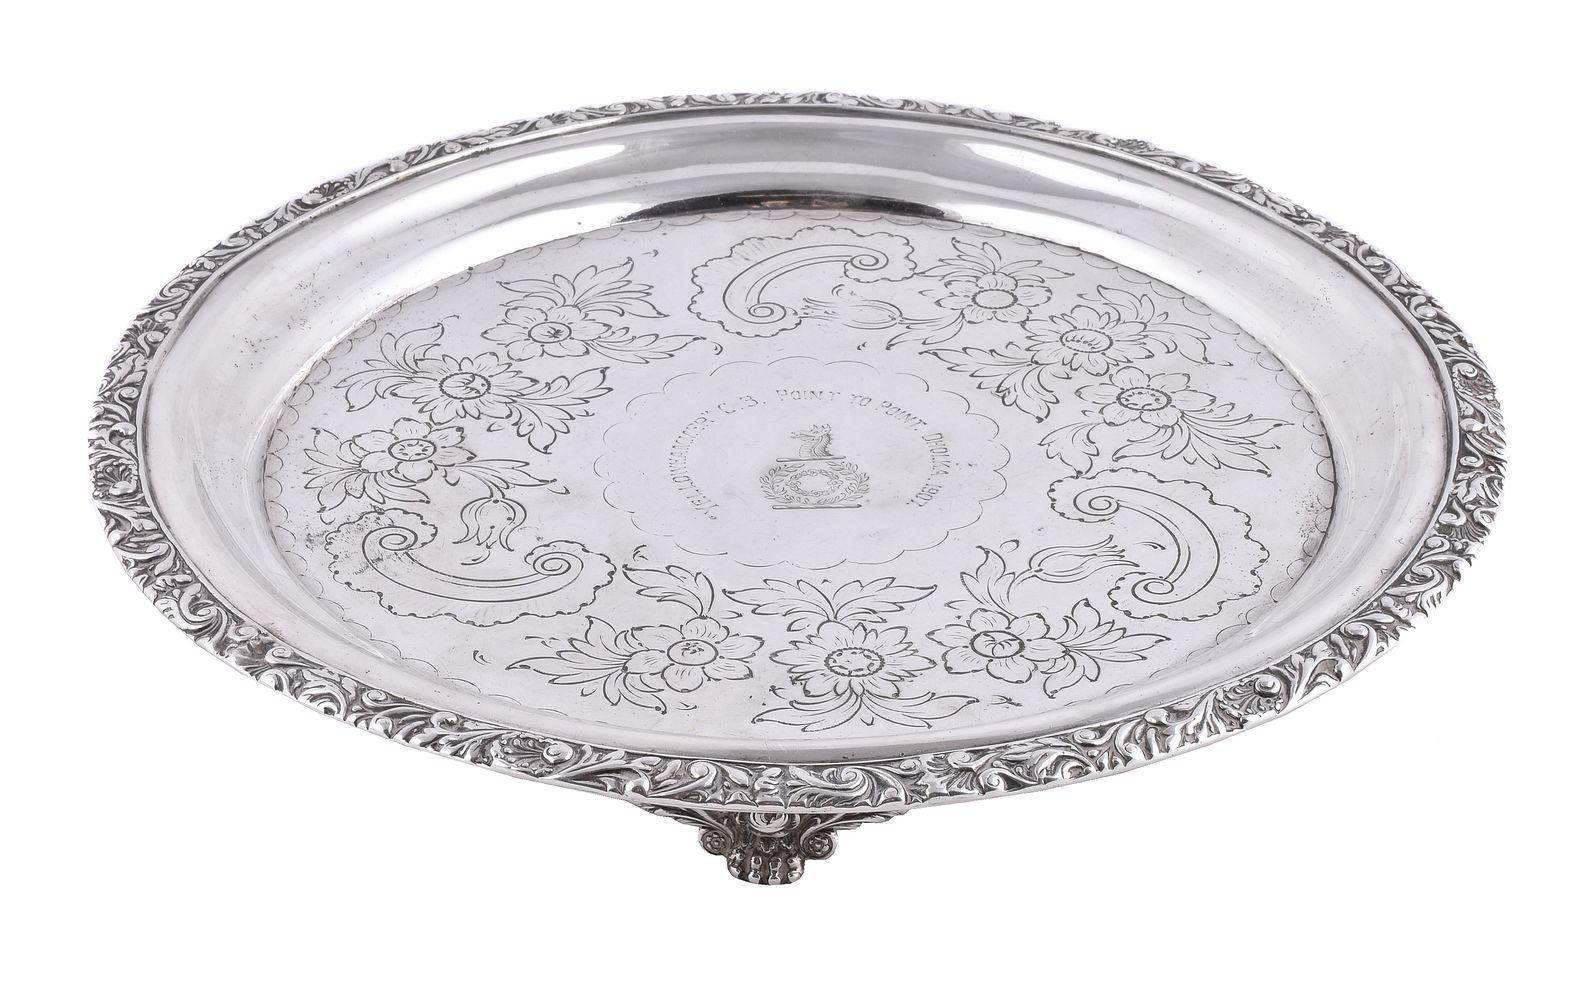 A George IV silver circular salver by Thomas Death